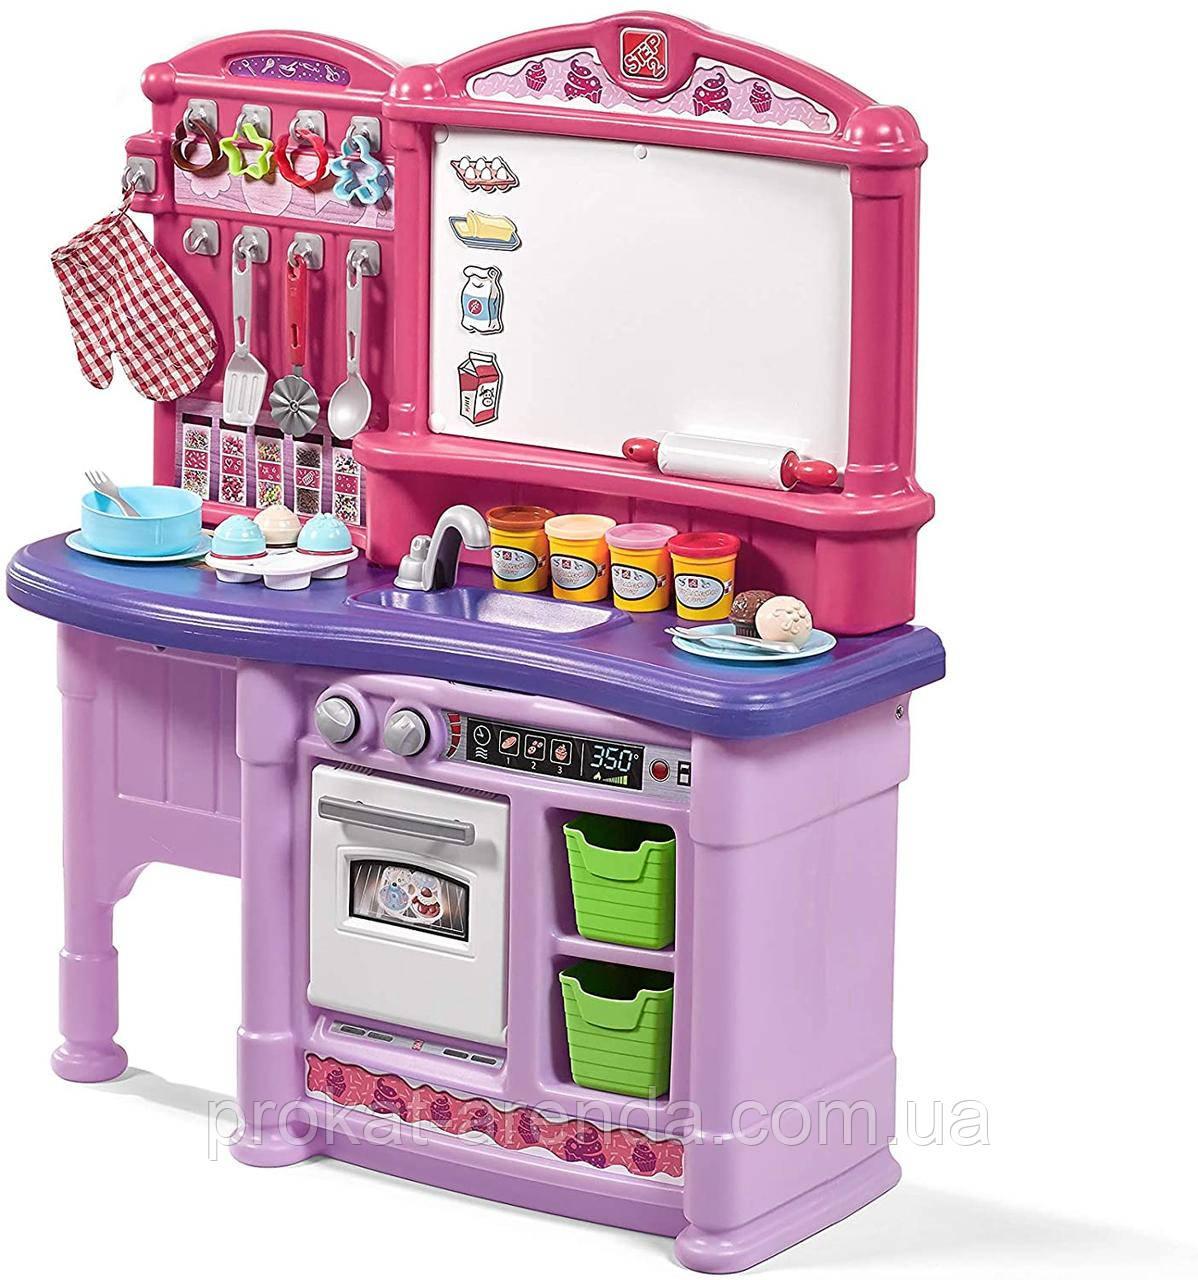 Ігрова кухня Step2